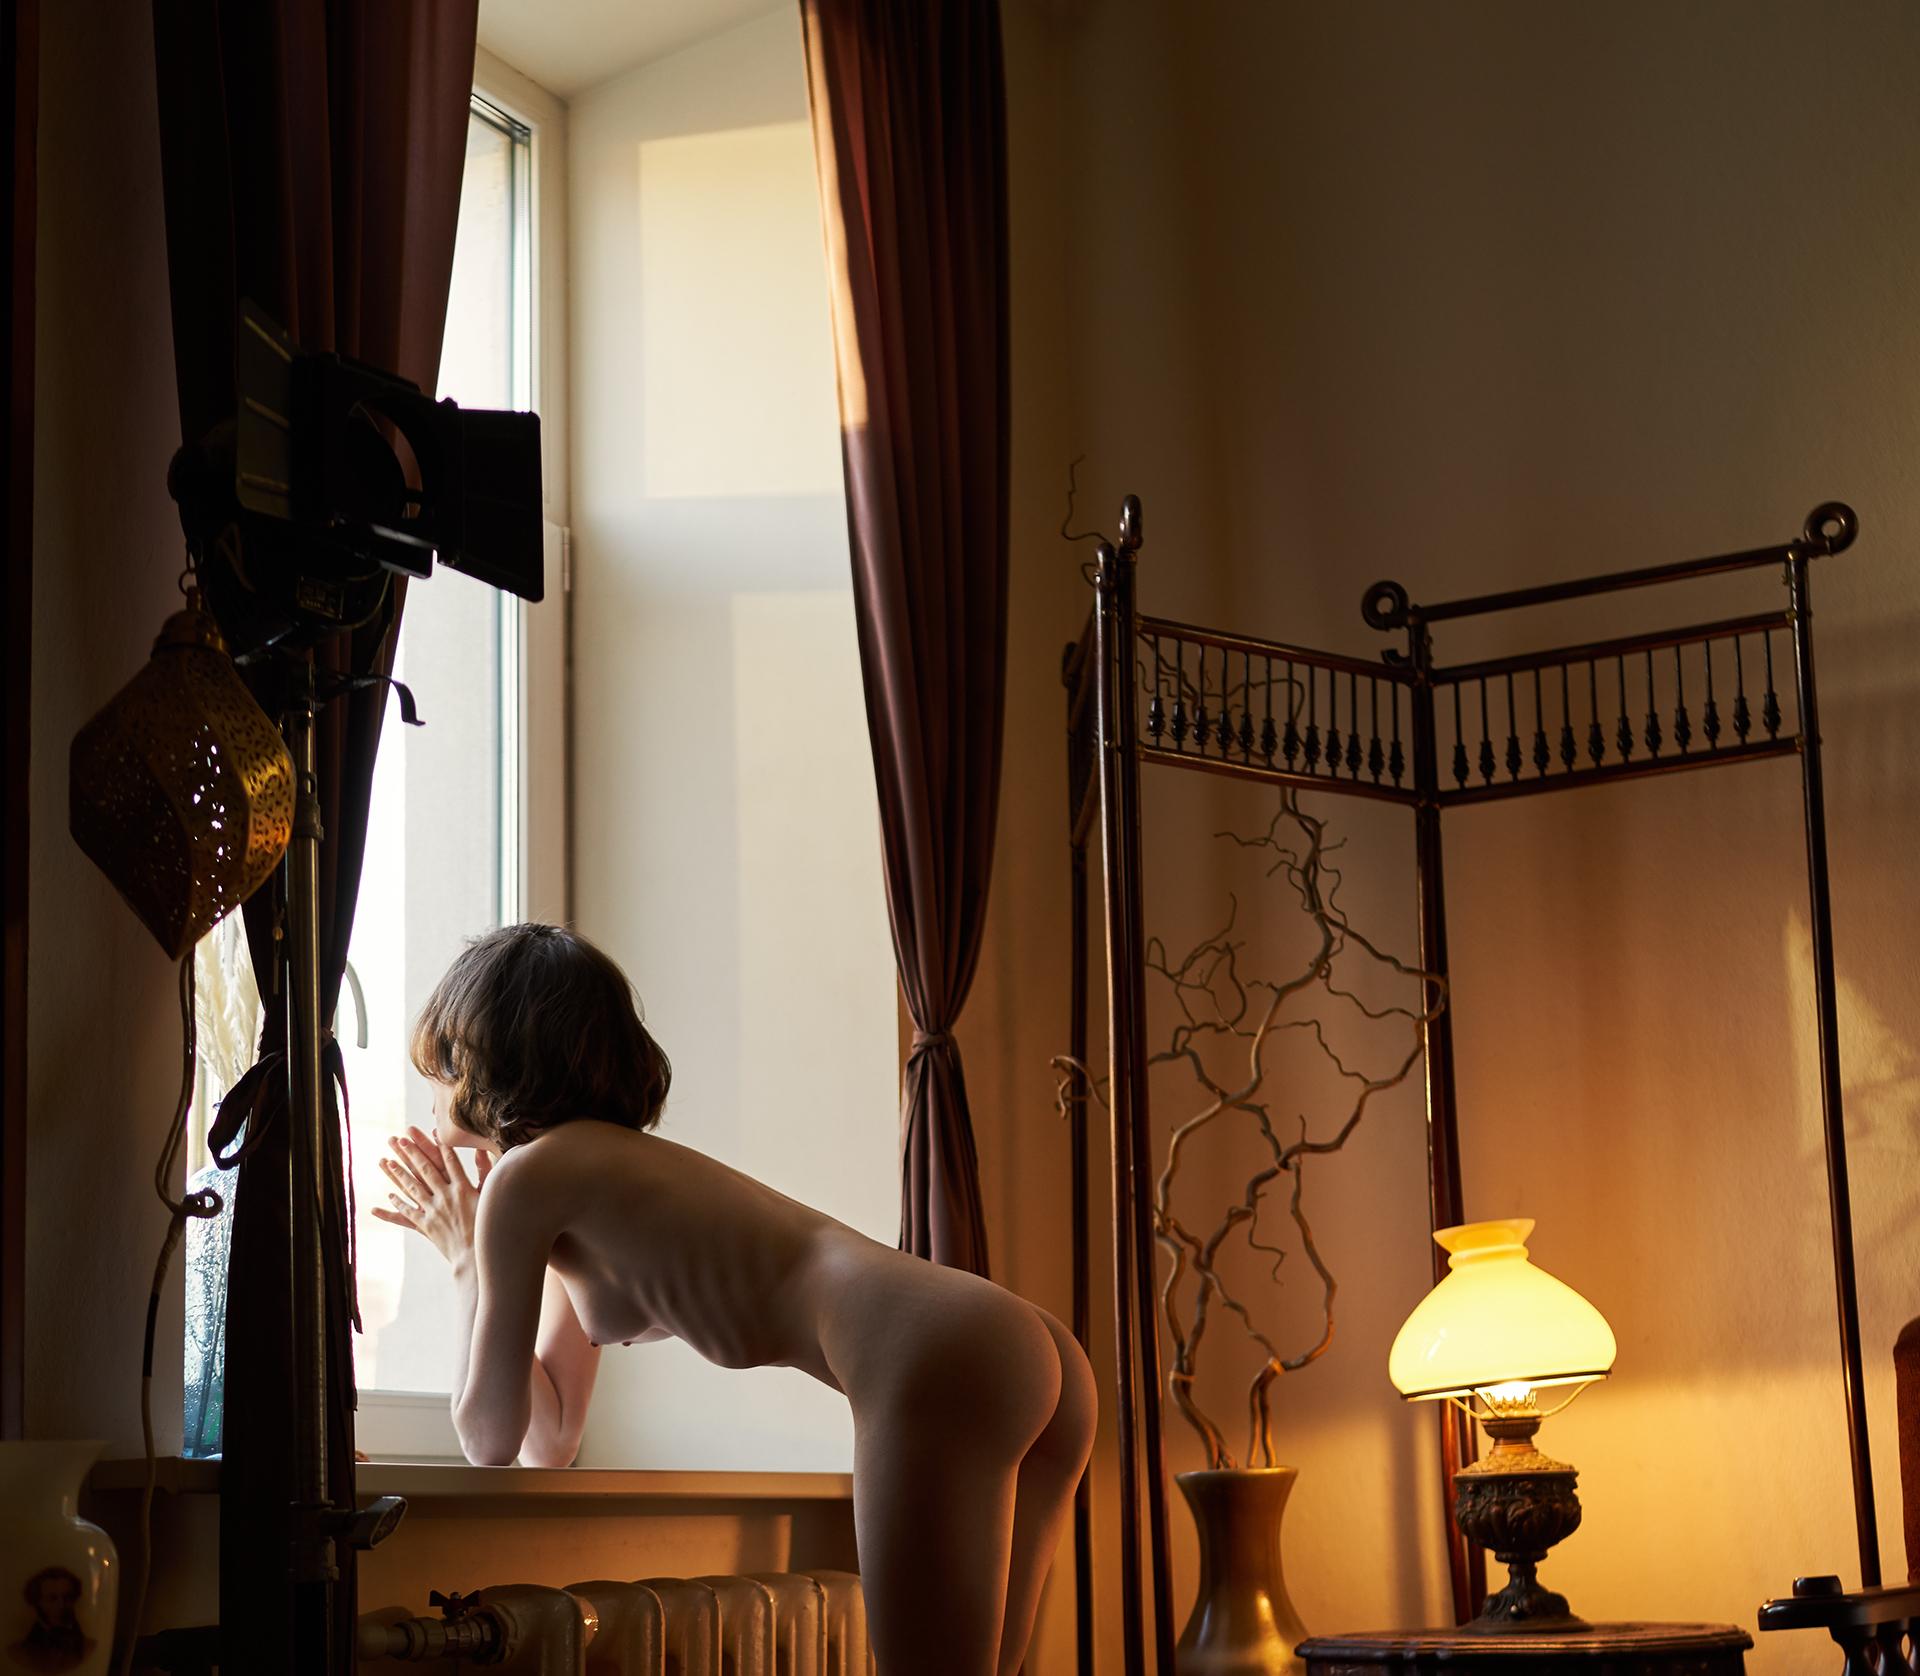 Saint-Petersburg / фотограф Роман Филиппов